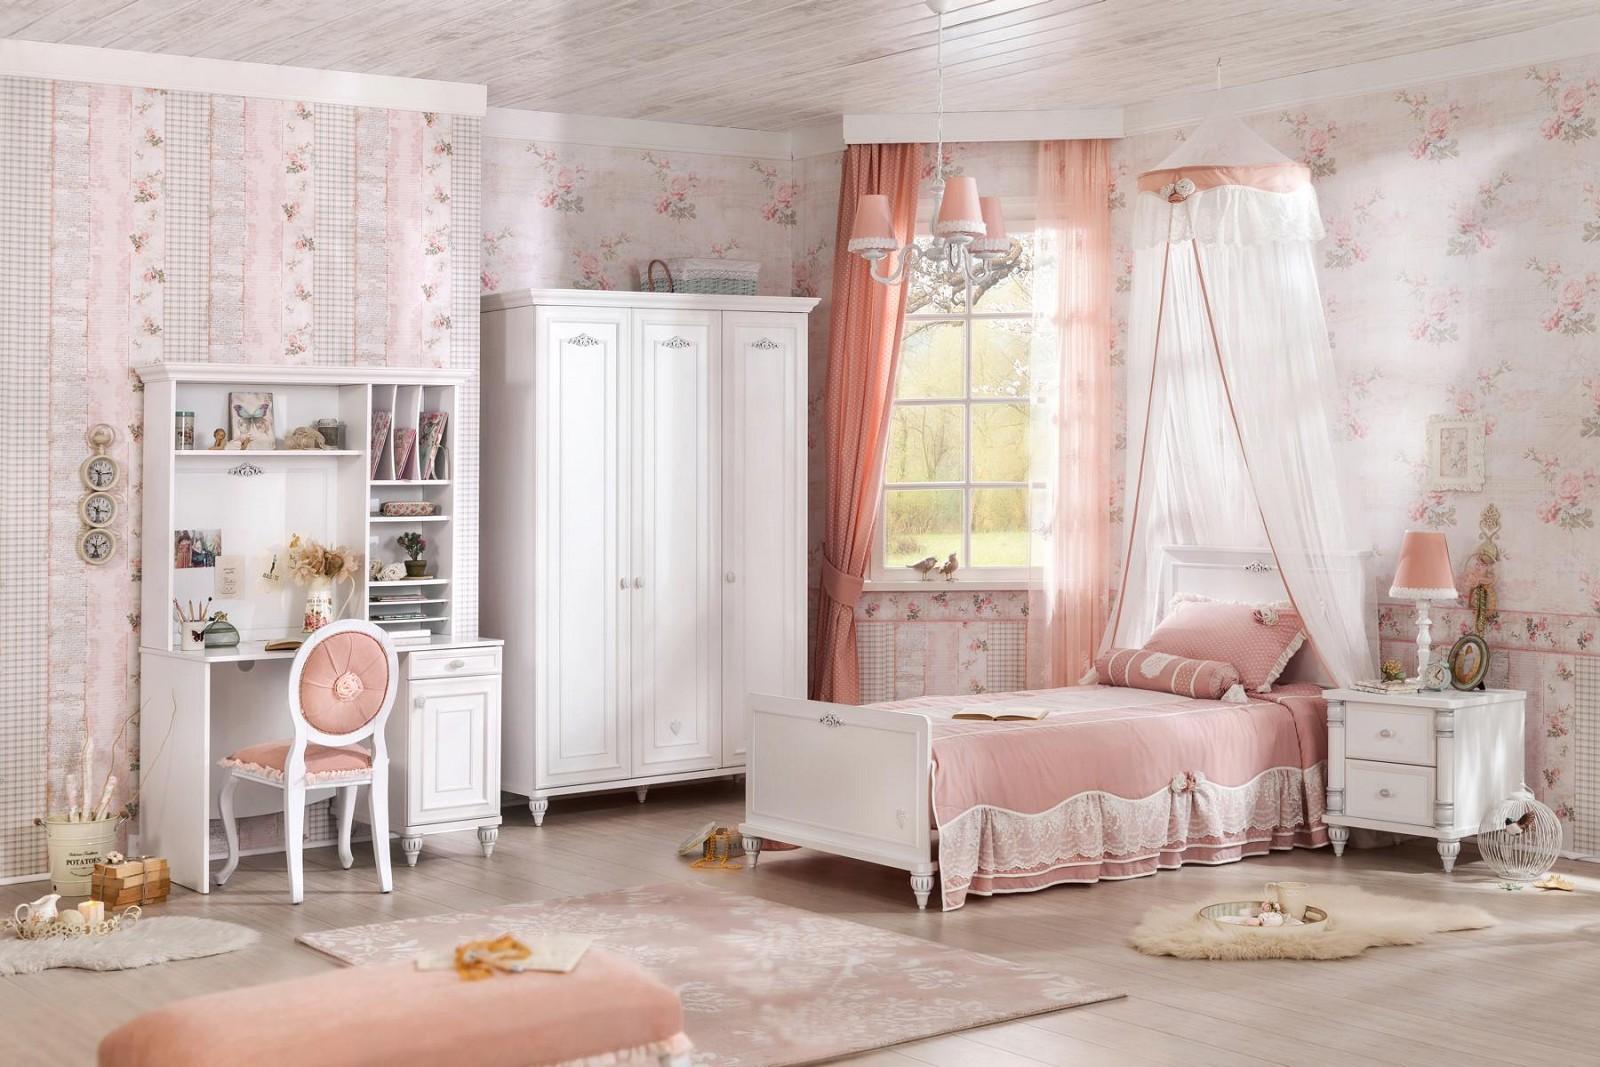 Full Size of Kinderzimmer Prinzessin Komplett Wei Romantica Furnart Regal Weiß Regale Bett Sofa Prinzessinen Kinderzimmer Kinderzimmer Prinzessin